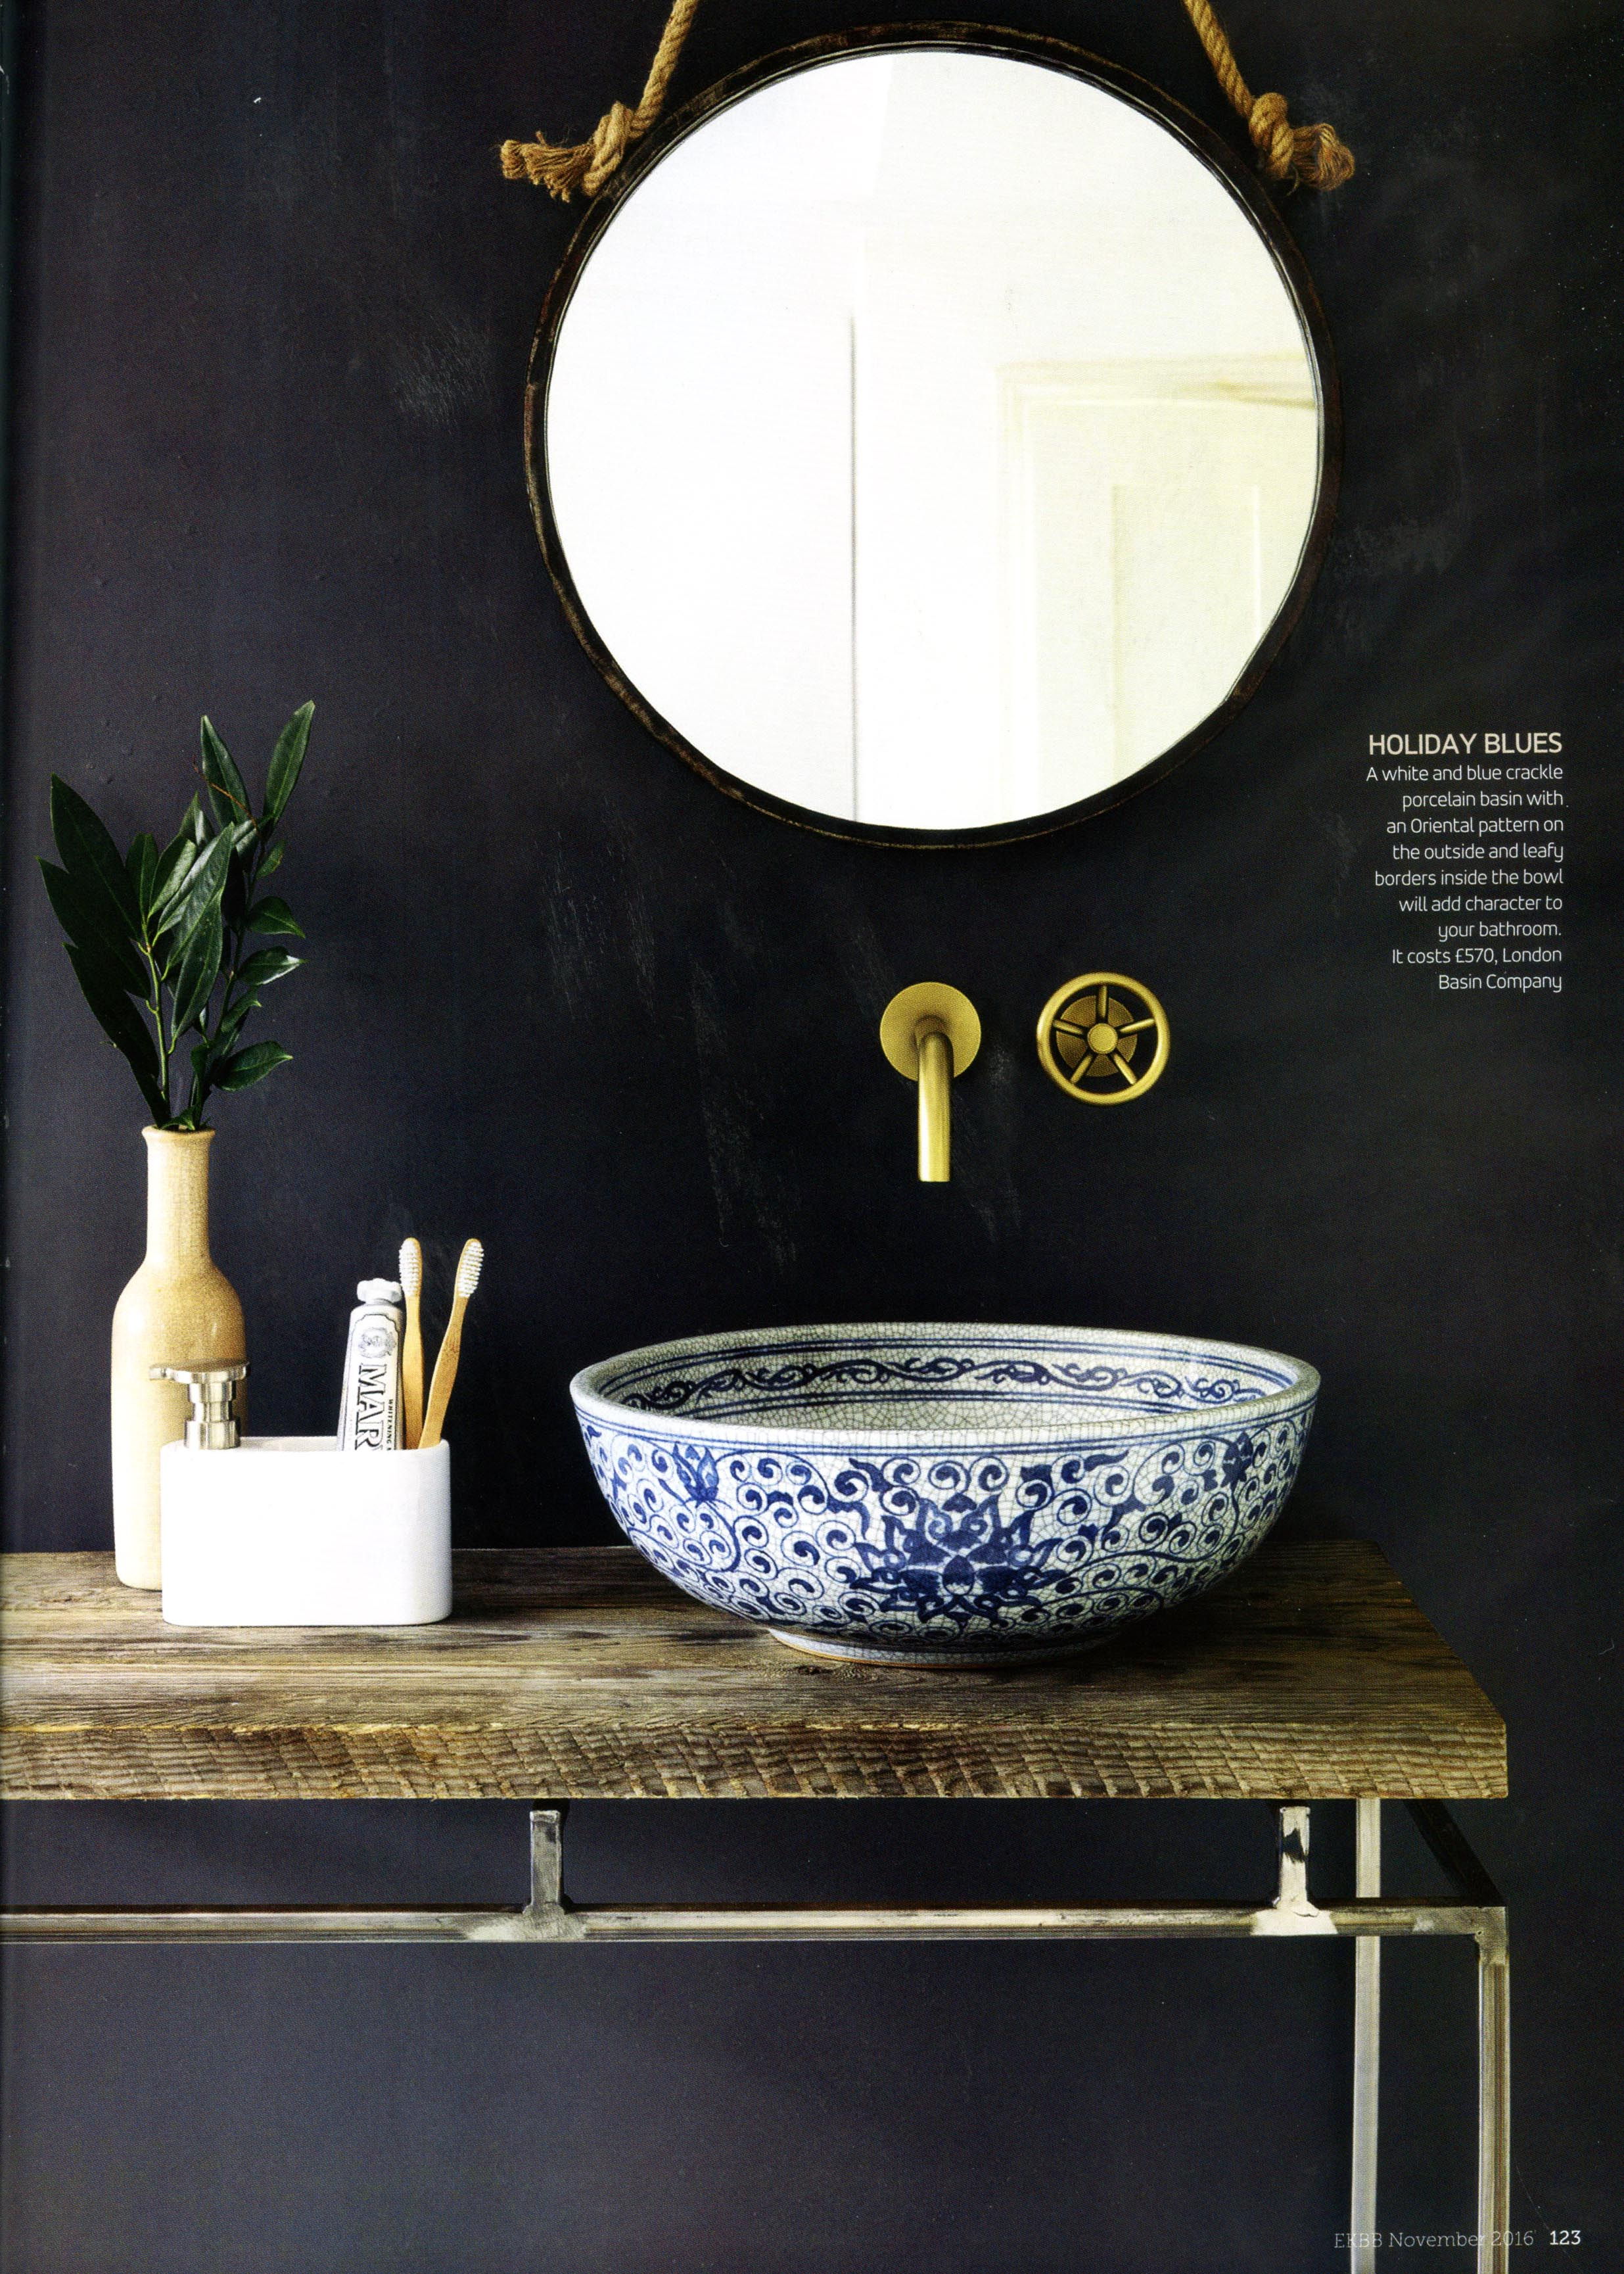 Essential Kitchen Bathroom Bedroom November 2016 LBC.jpg